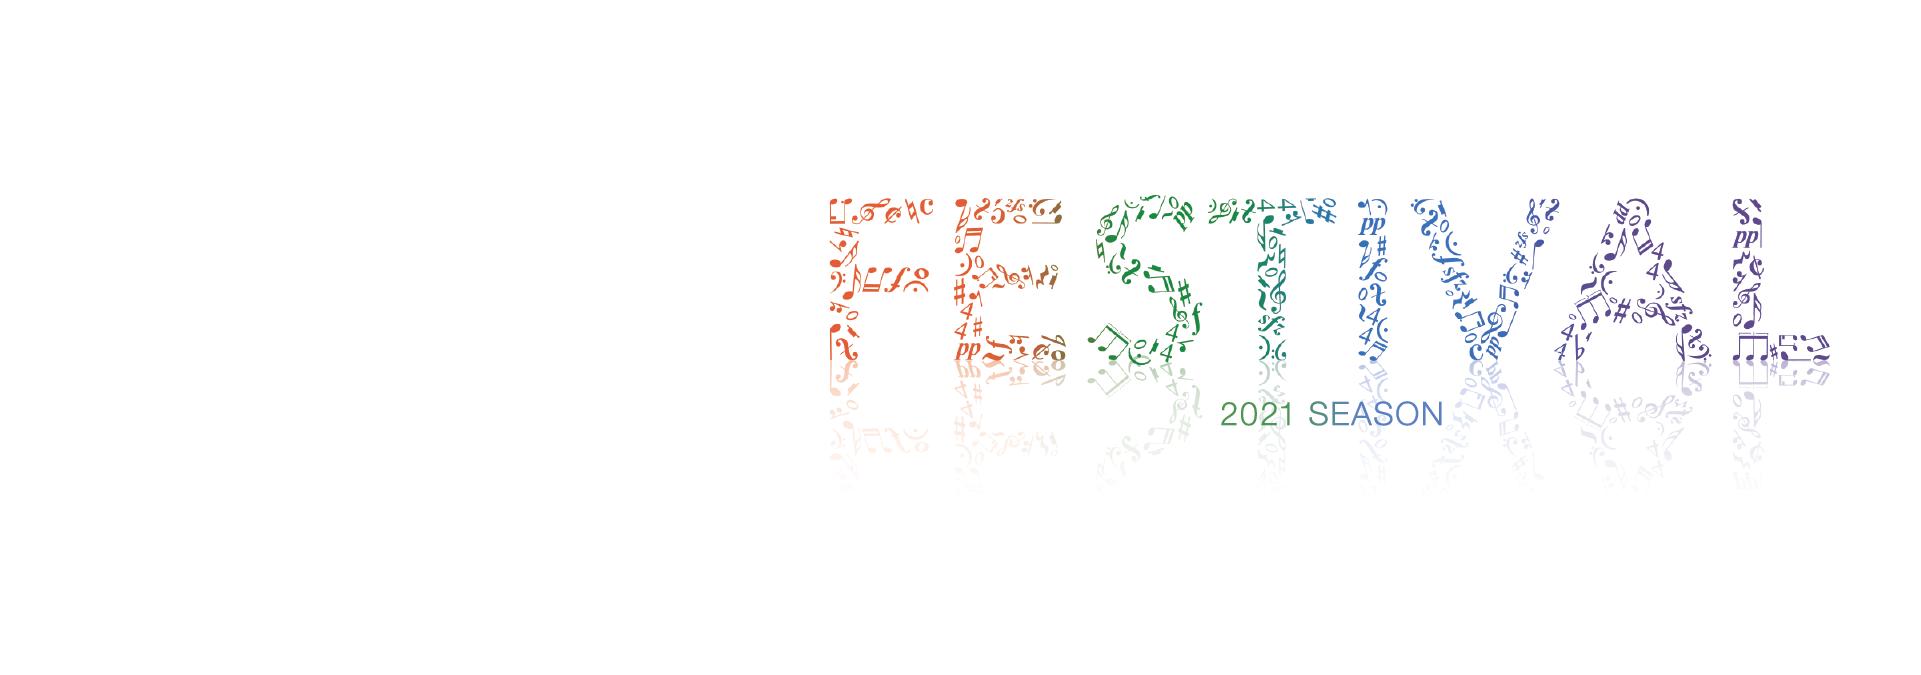 2021 Festival Season